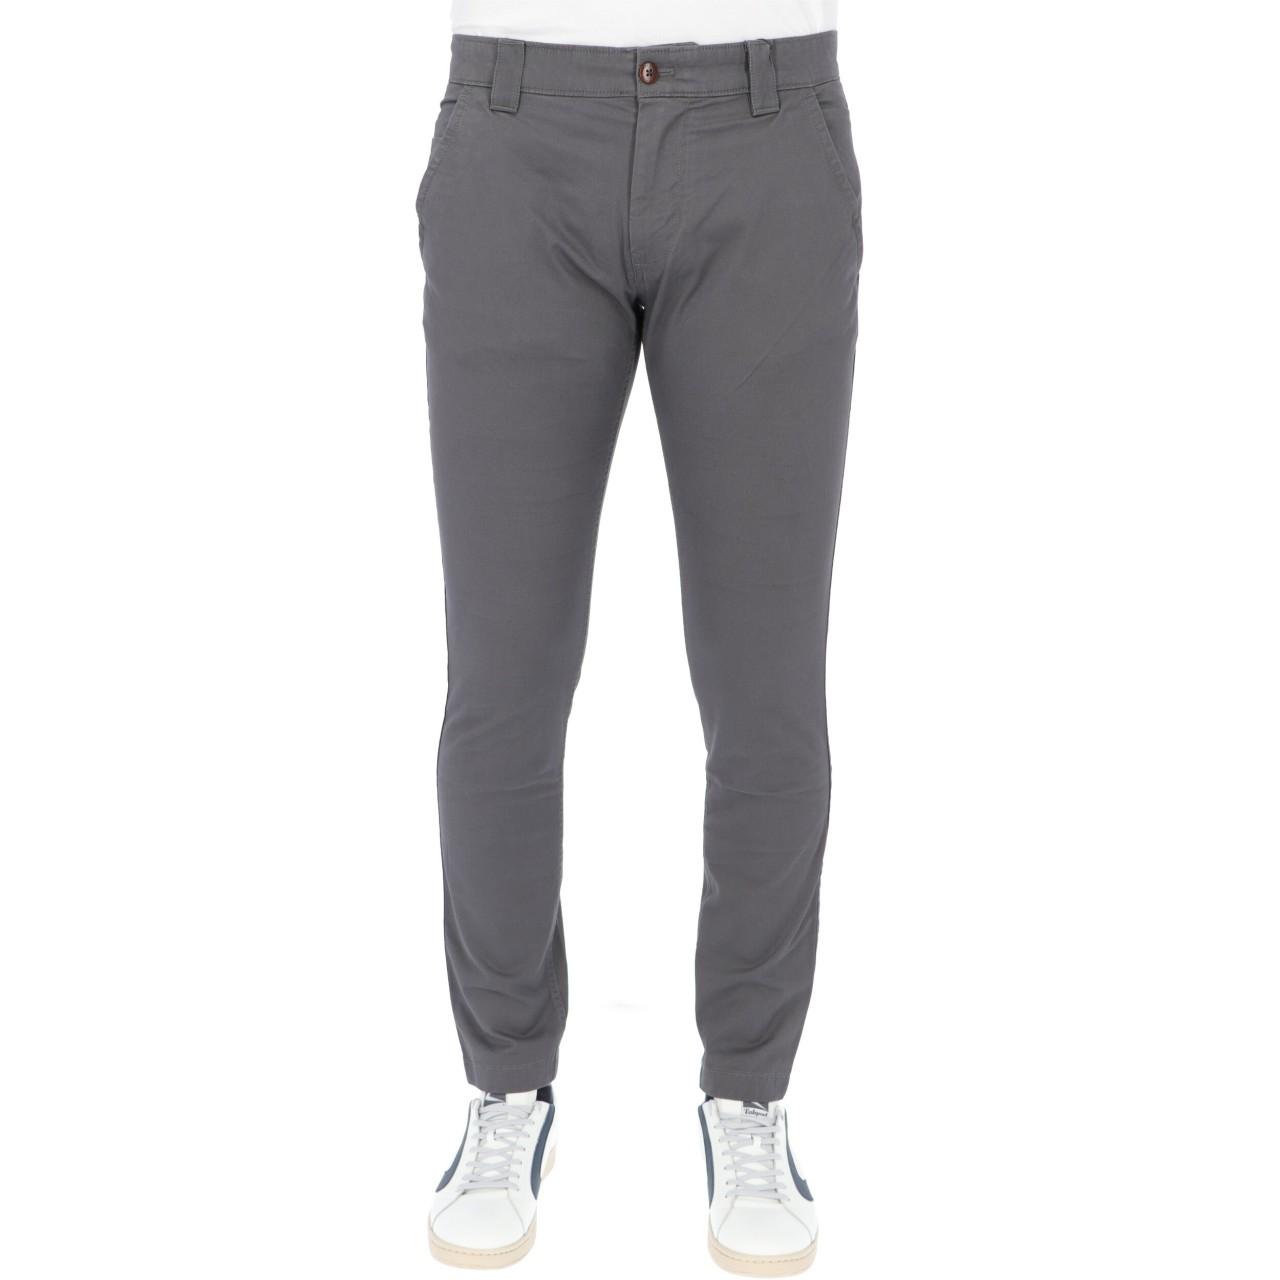 Tommy hilfiger Uomo Pantalone Tommy Jeans Uomo Scanton Chino Pant 09595Q